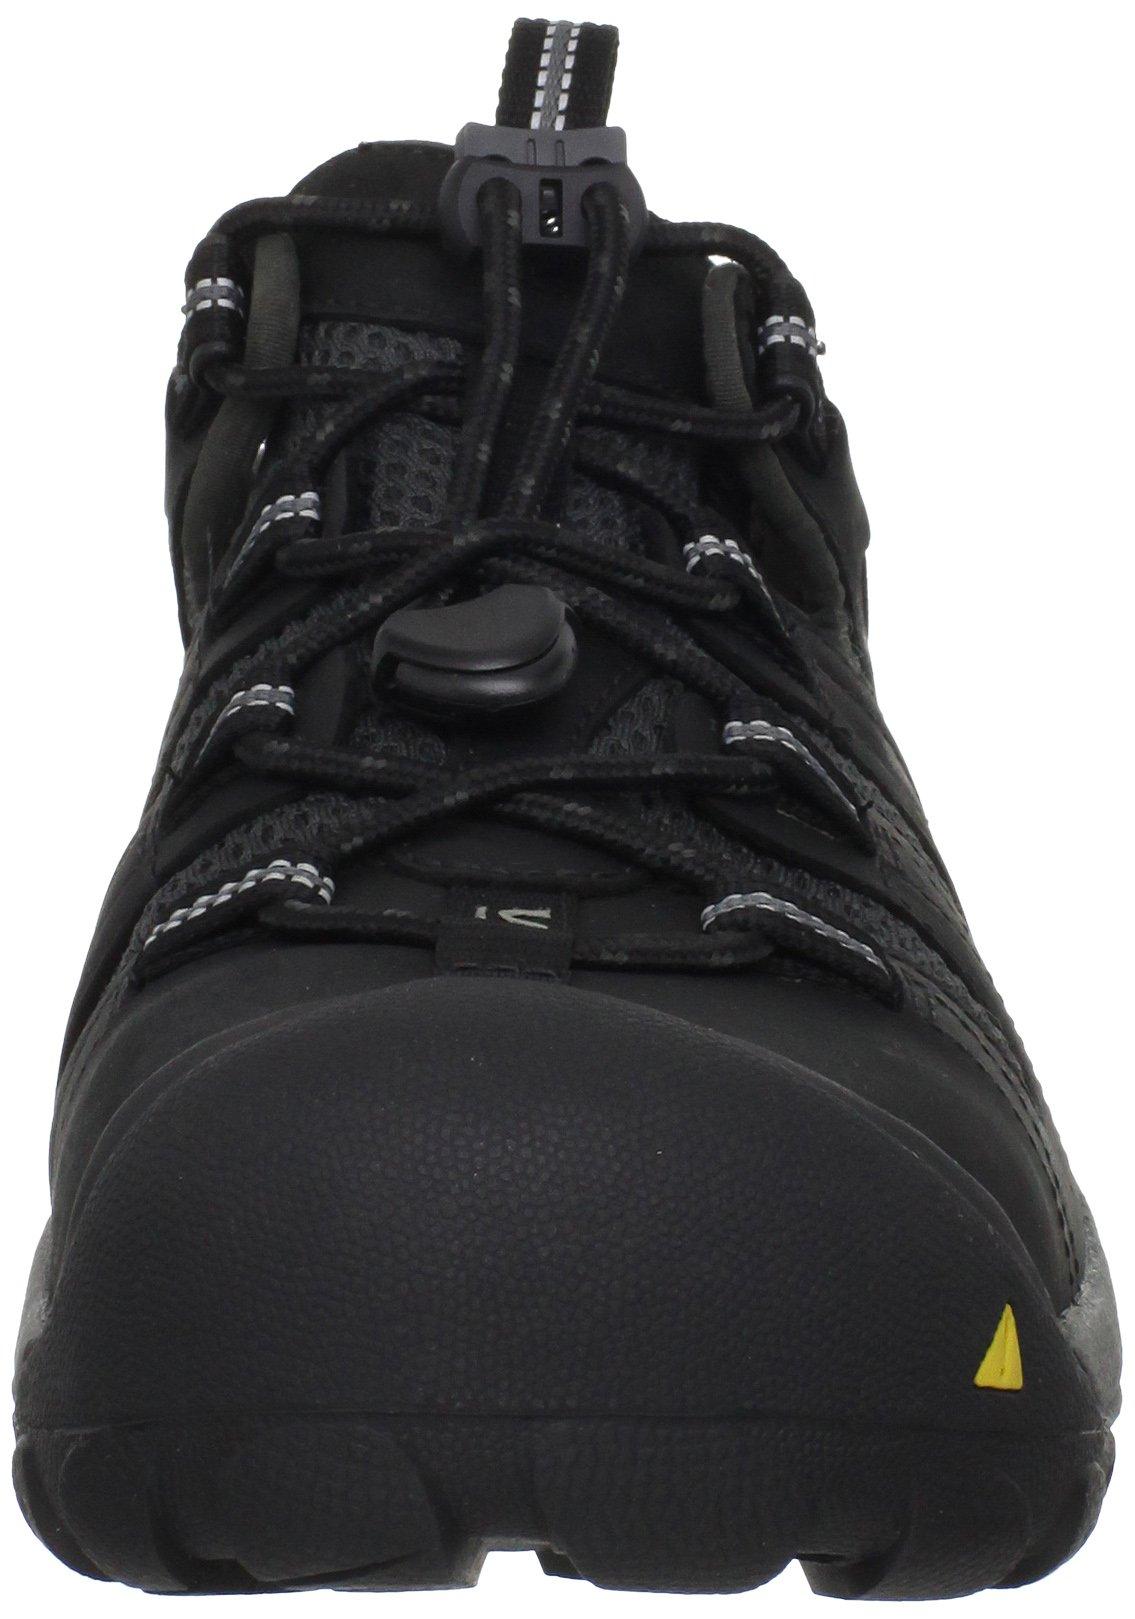 KEEN Utility Men's Atlanta Cool Steel Toe Work Shoe,Black,9.5 EE US by KEEN Utility (Image #4)